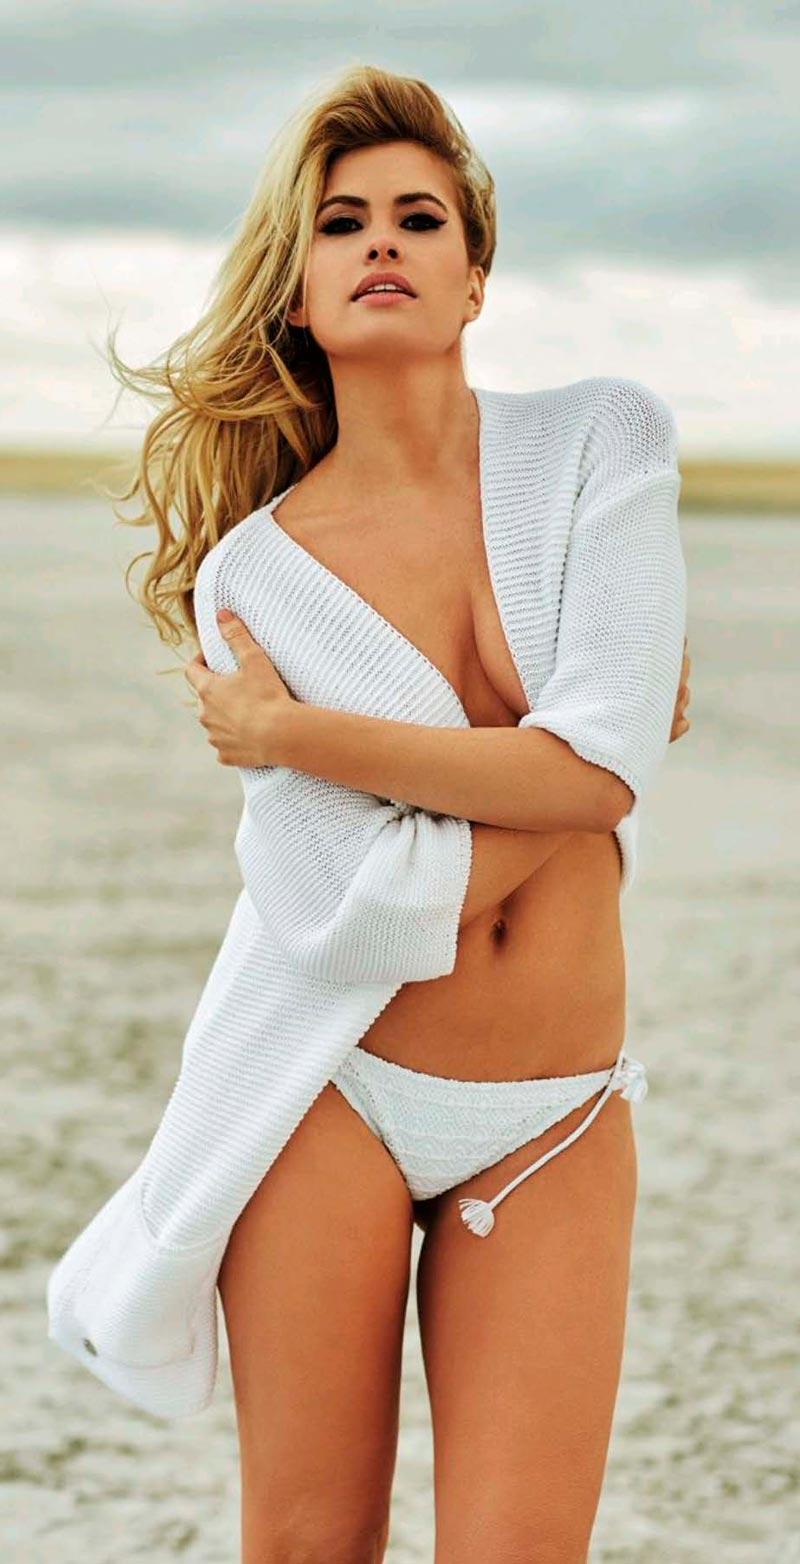 Adriana Abenia Topless Blusa Bikini Playa